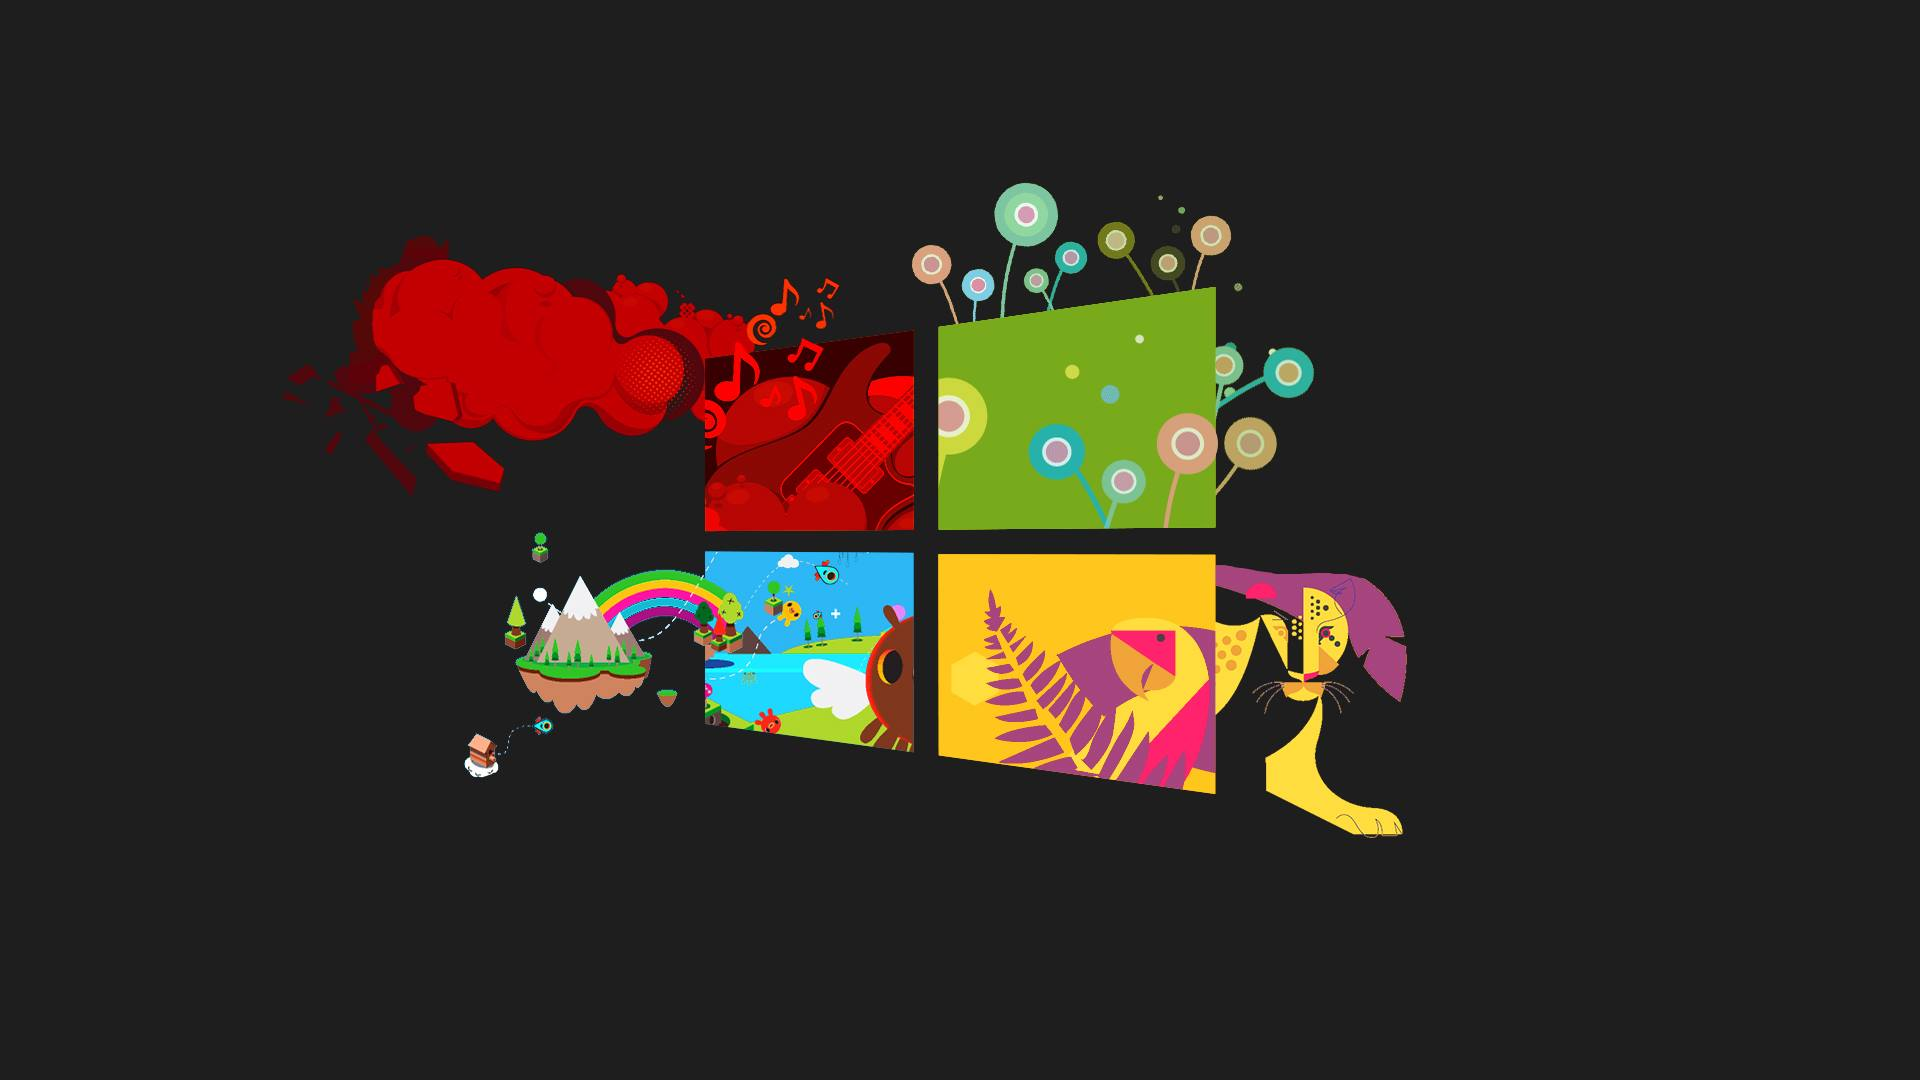 Free Download Raccolta Di Sfondi Windows 10 Hd Wallpapers